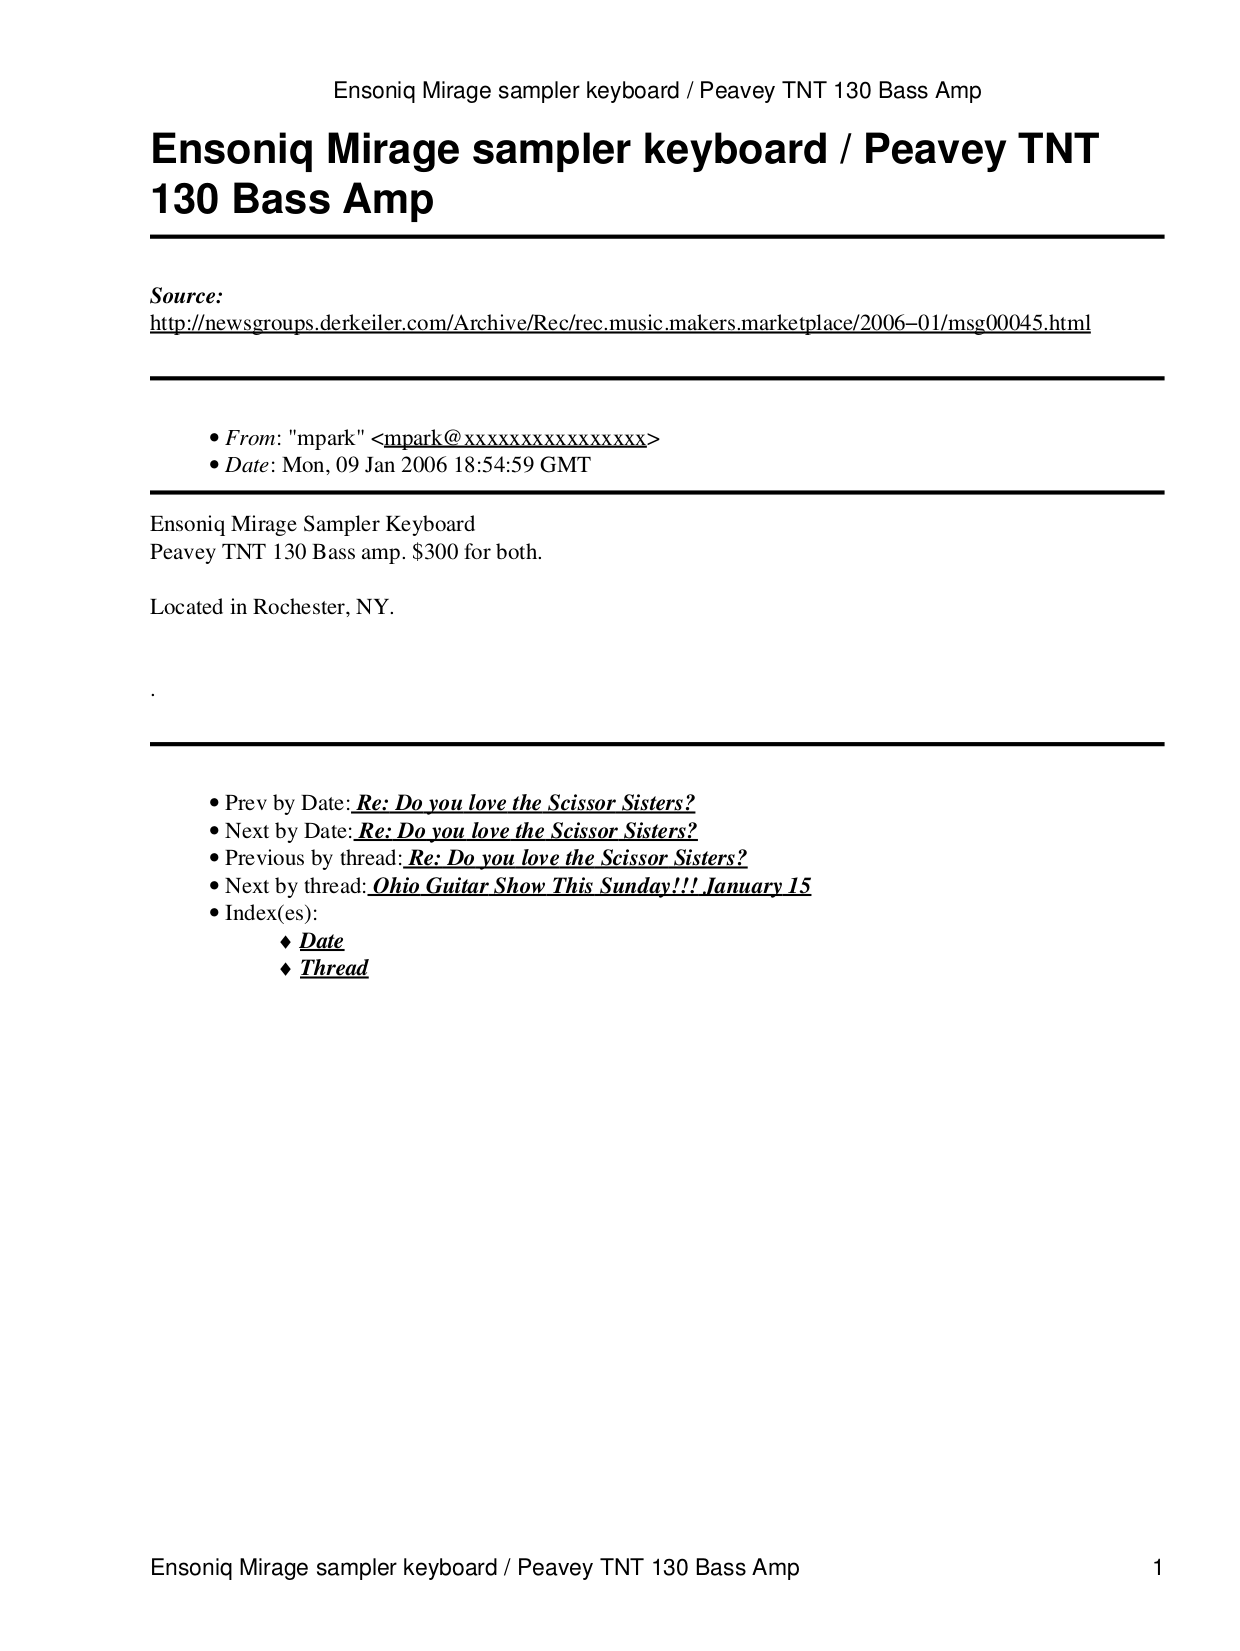 download free pdf for peavey tnt 130 amp manual rh umlib com Peavey User ManualsOnline Peavey User ManualsOnline